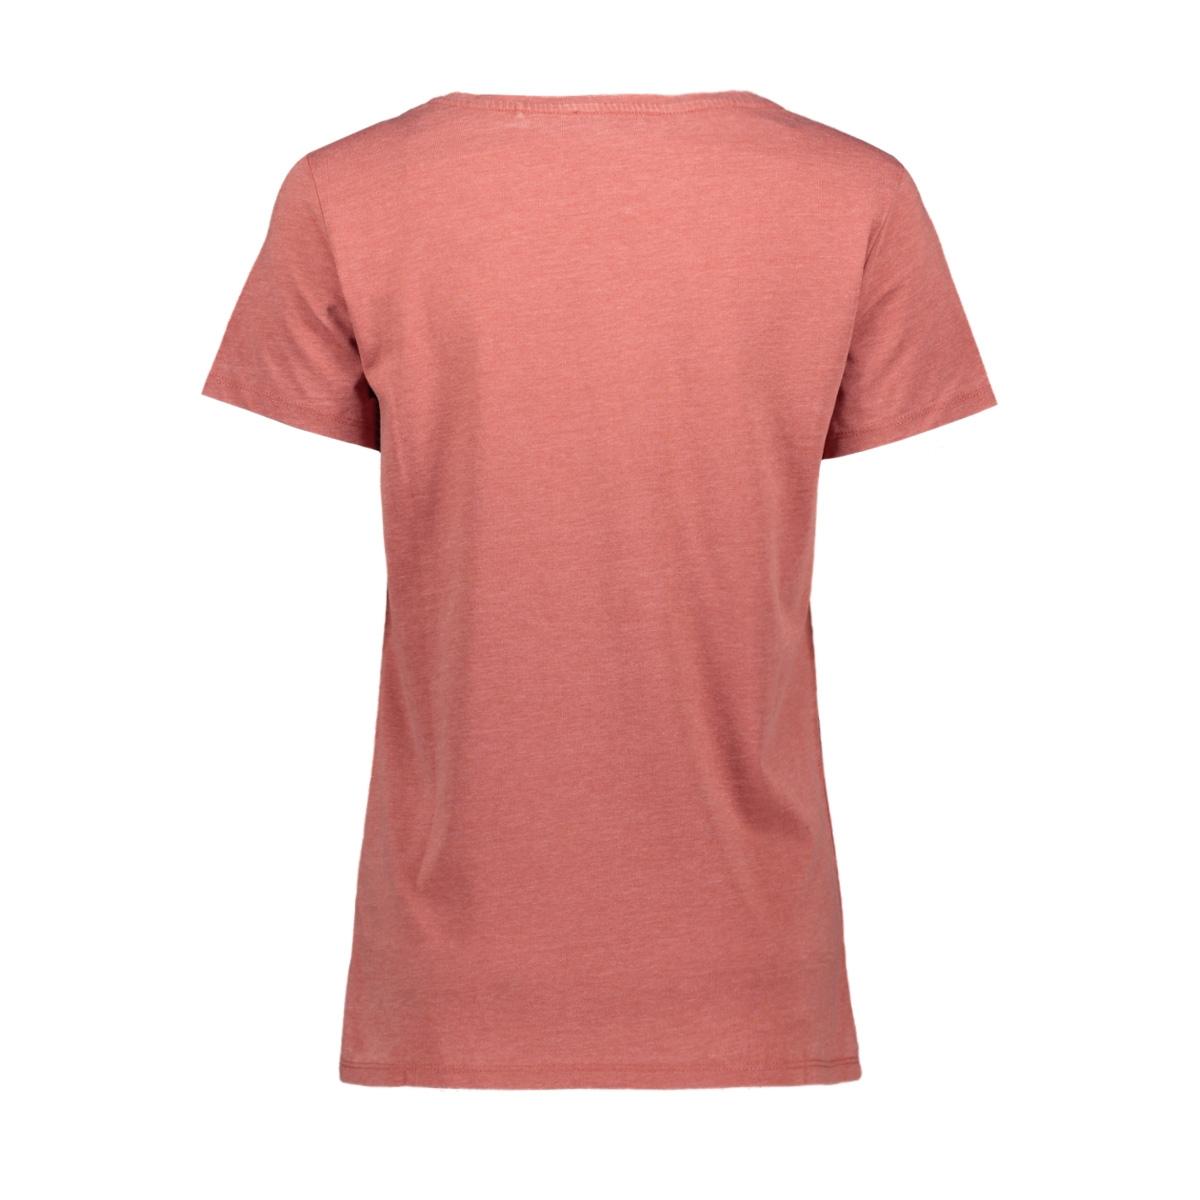 burn out shirt met artwork print 079cc1k020 edc t-shirt c805